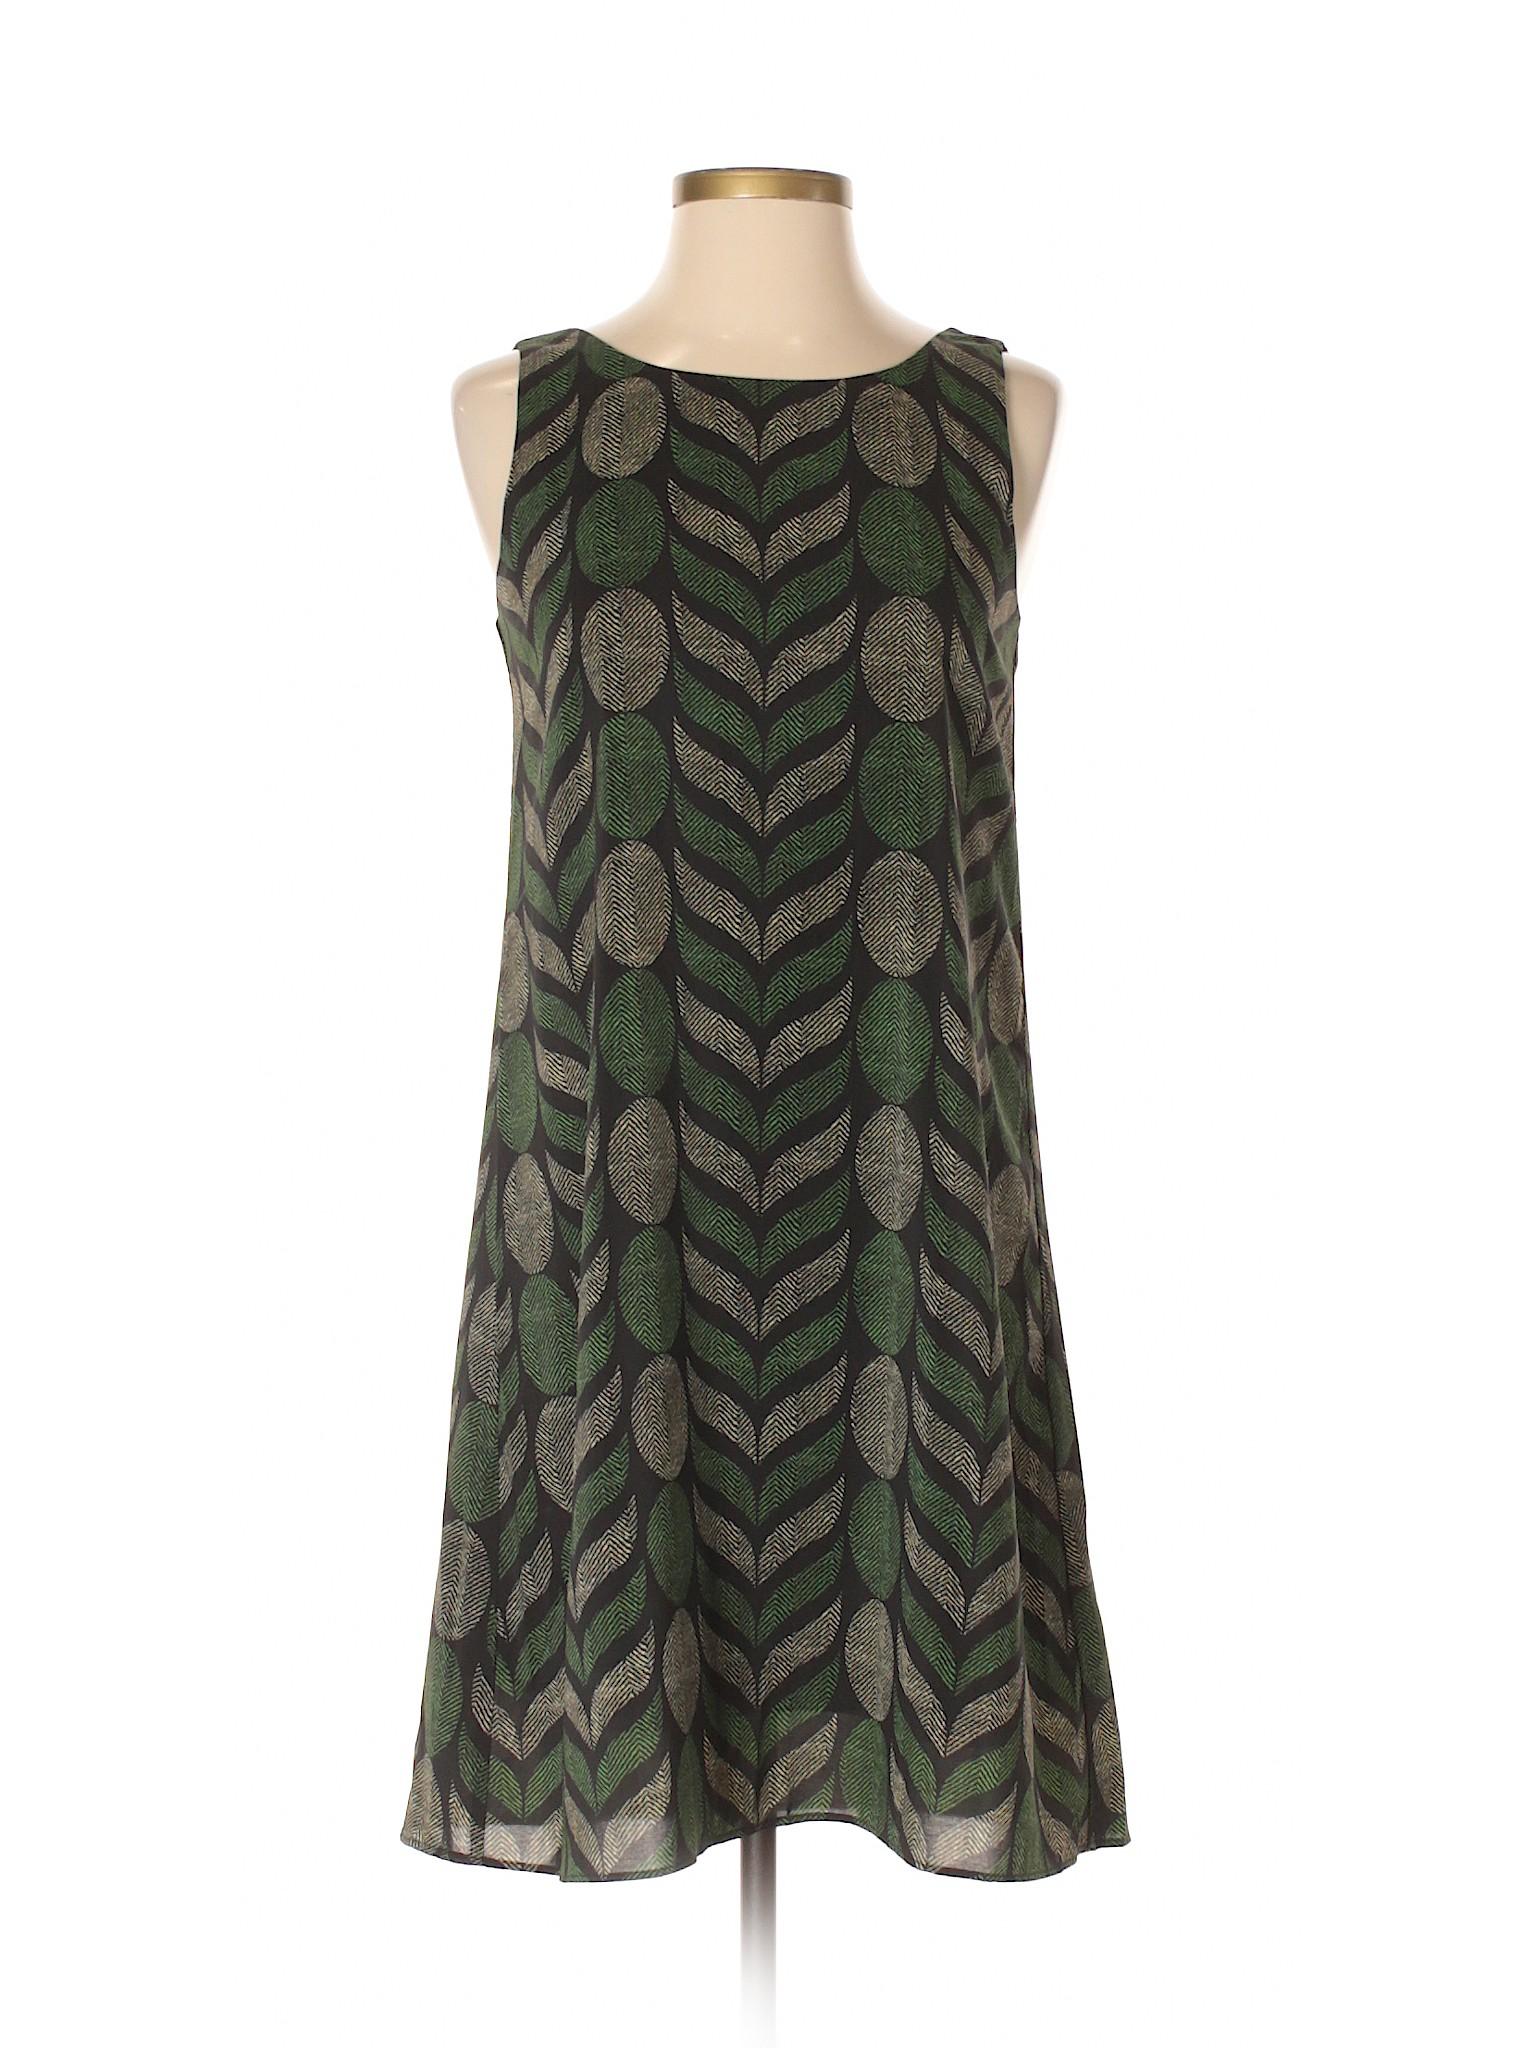 Philosophy Clothing Casual Selling Republic Dress Onwqx8qda4